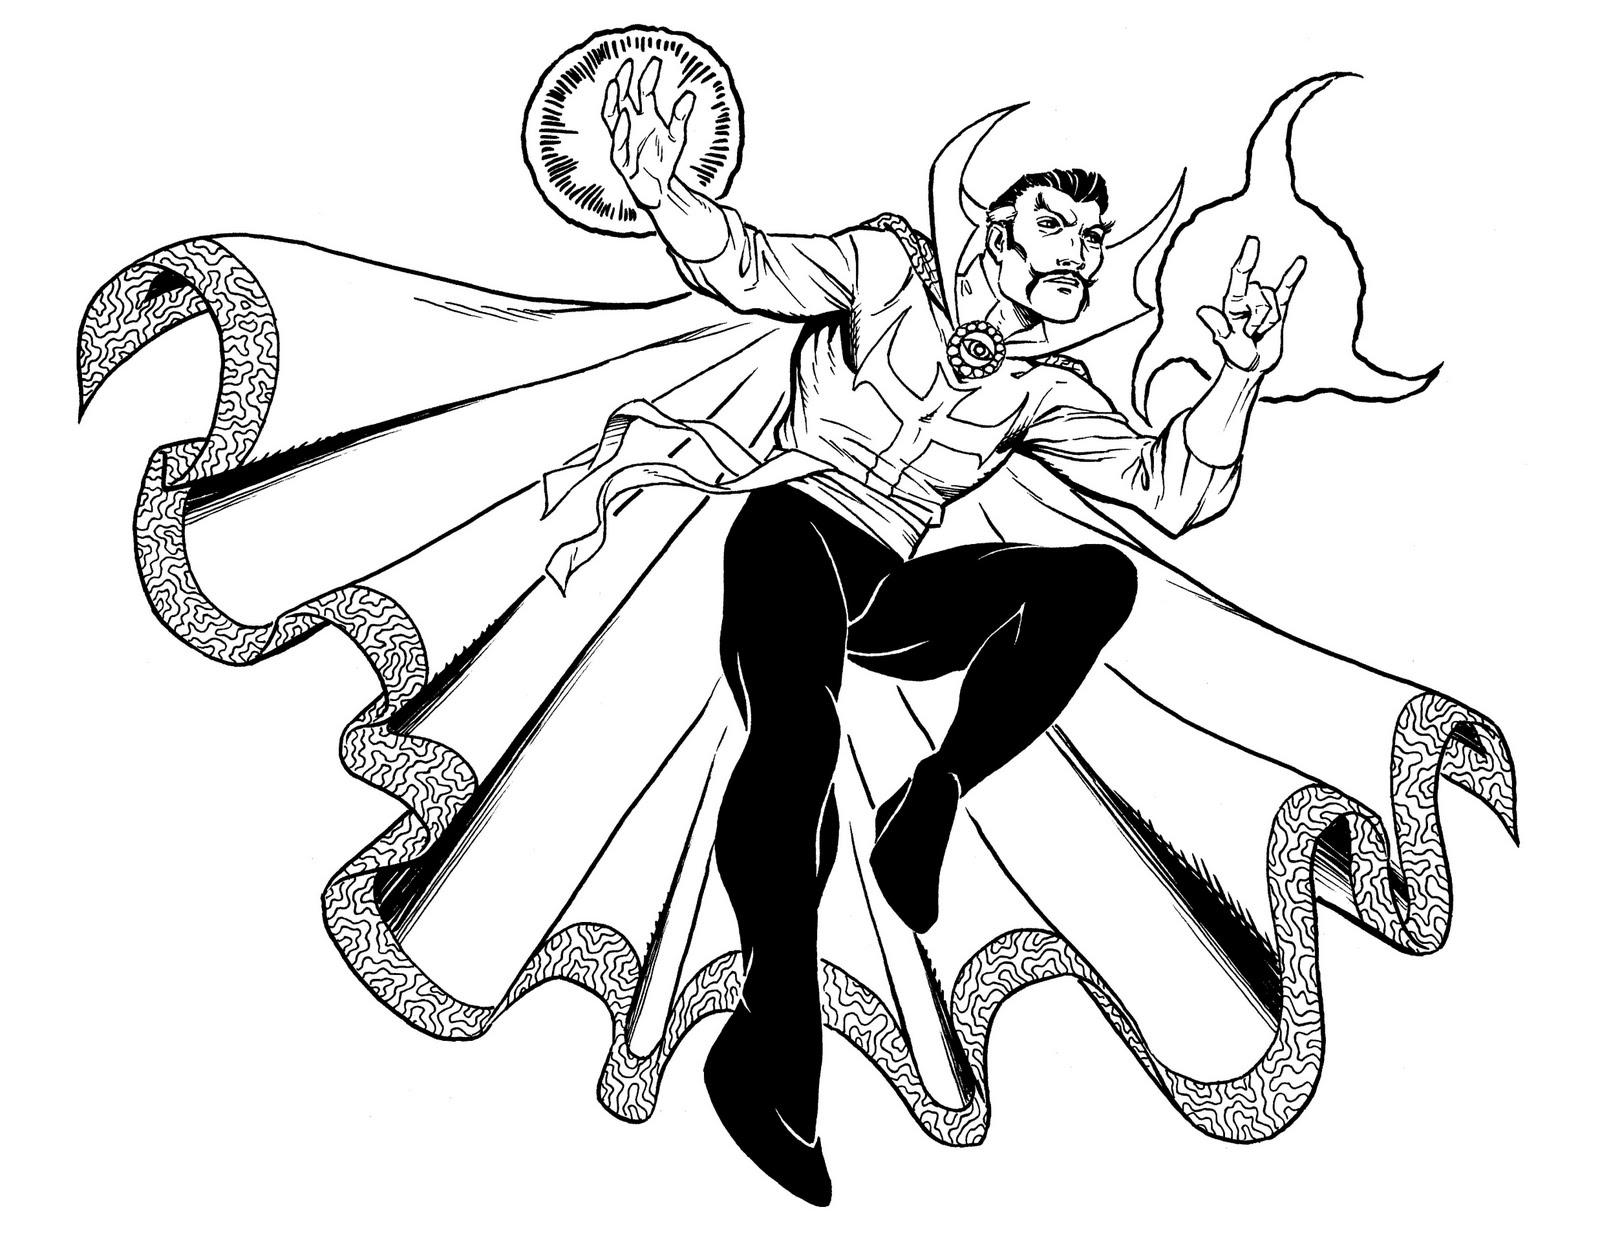 Doctor Strange Show His Skill